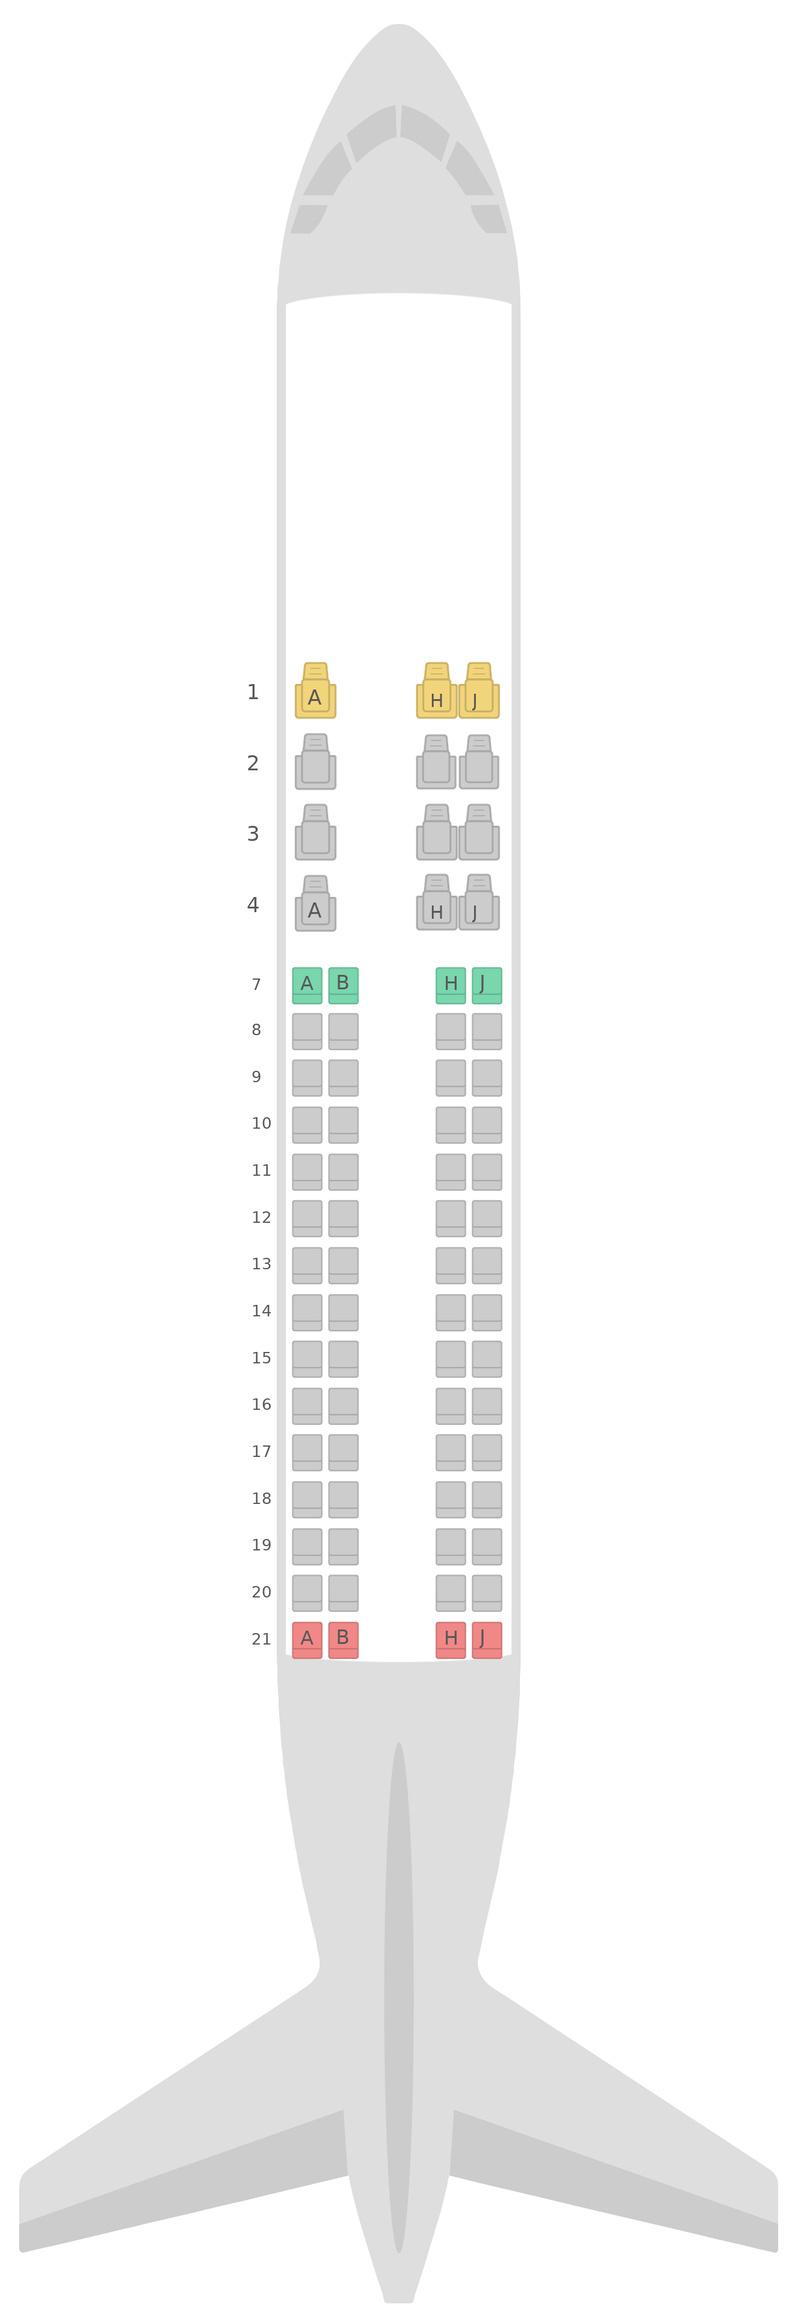 Seat Map Royal Jordanian Airlines Embraer E175 (E75)